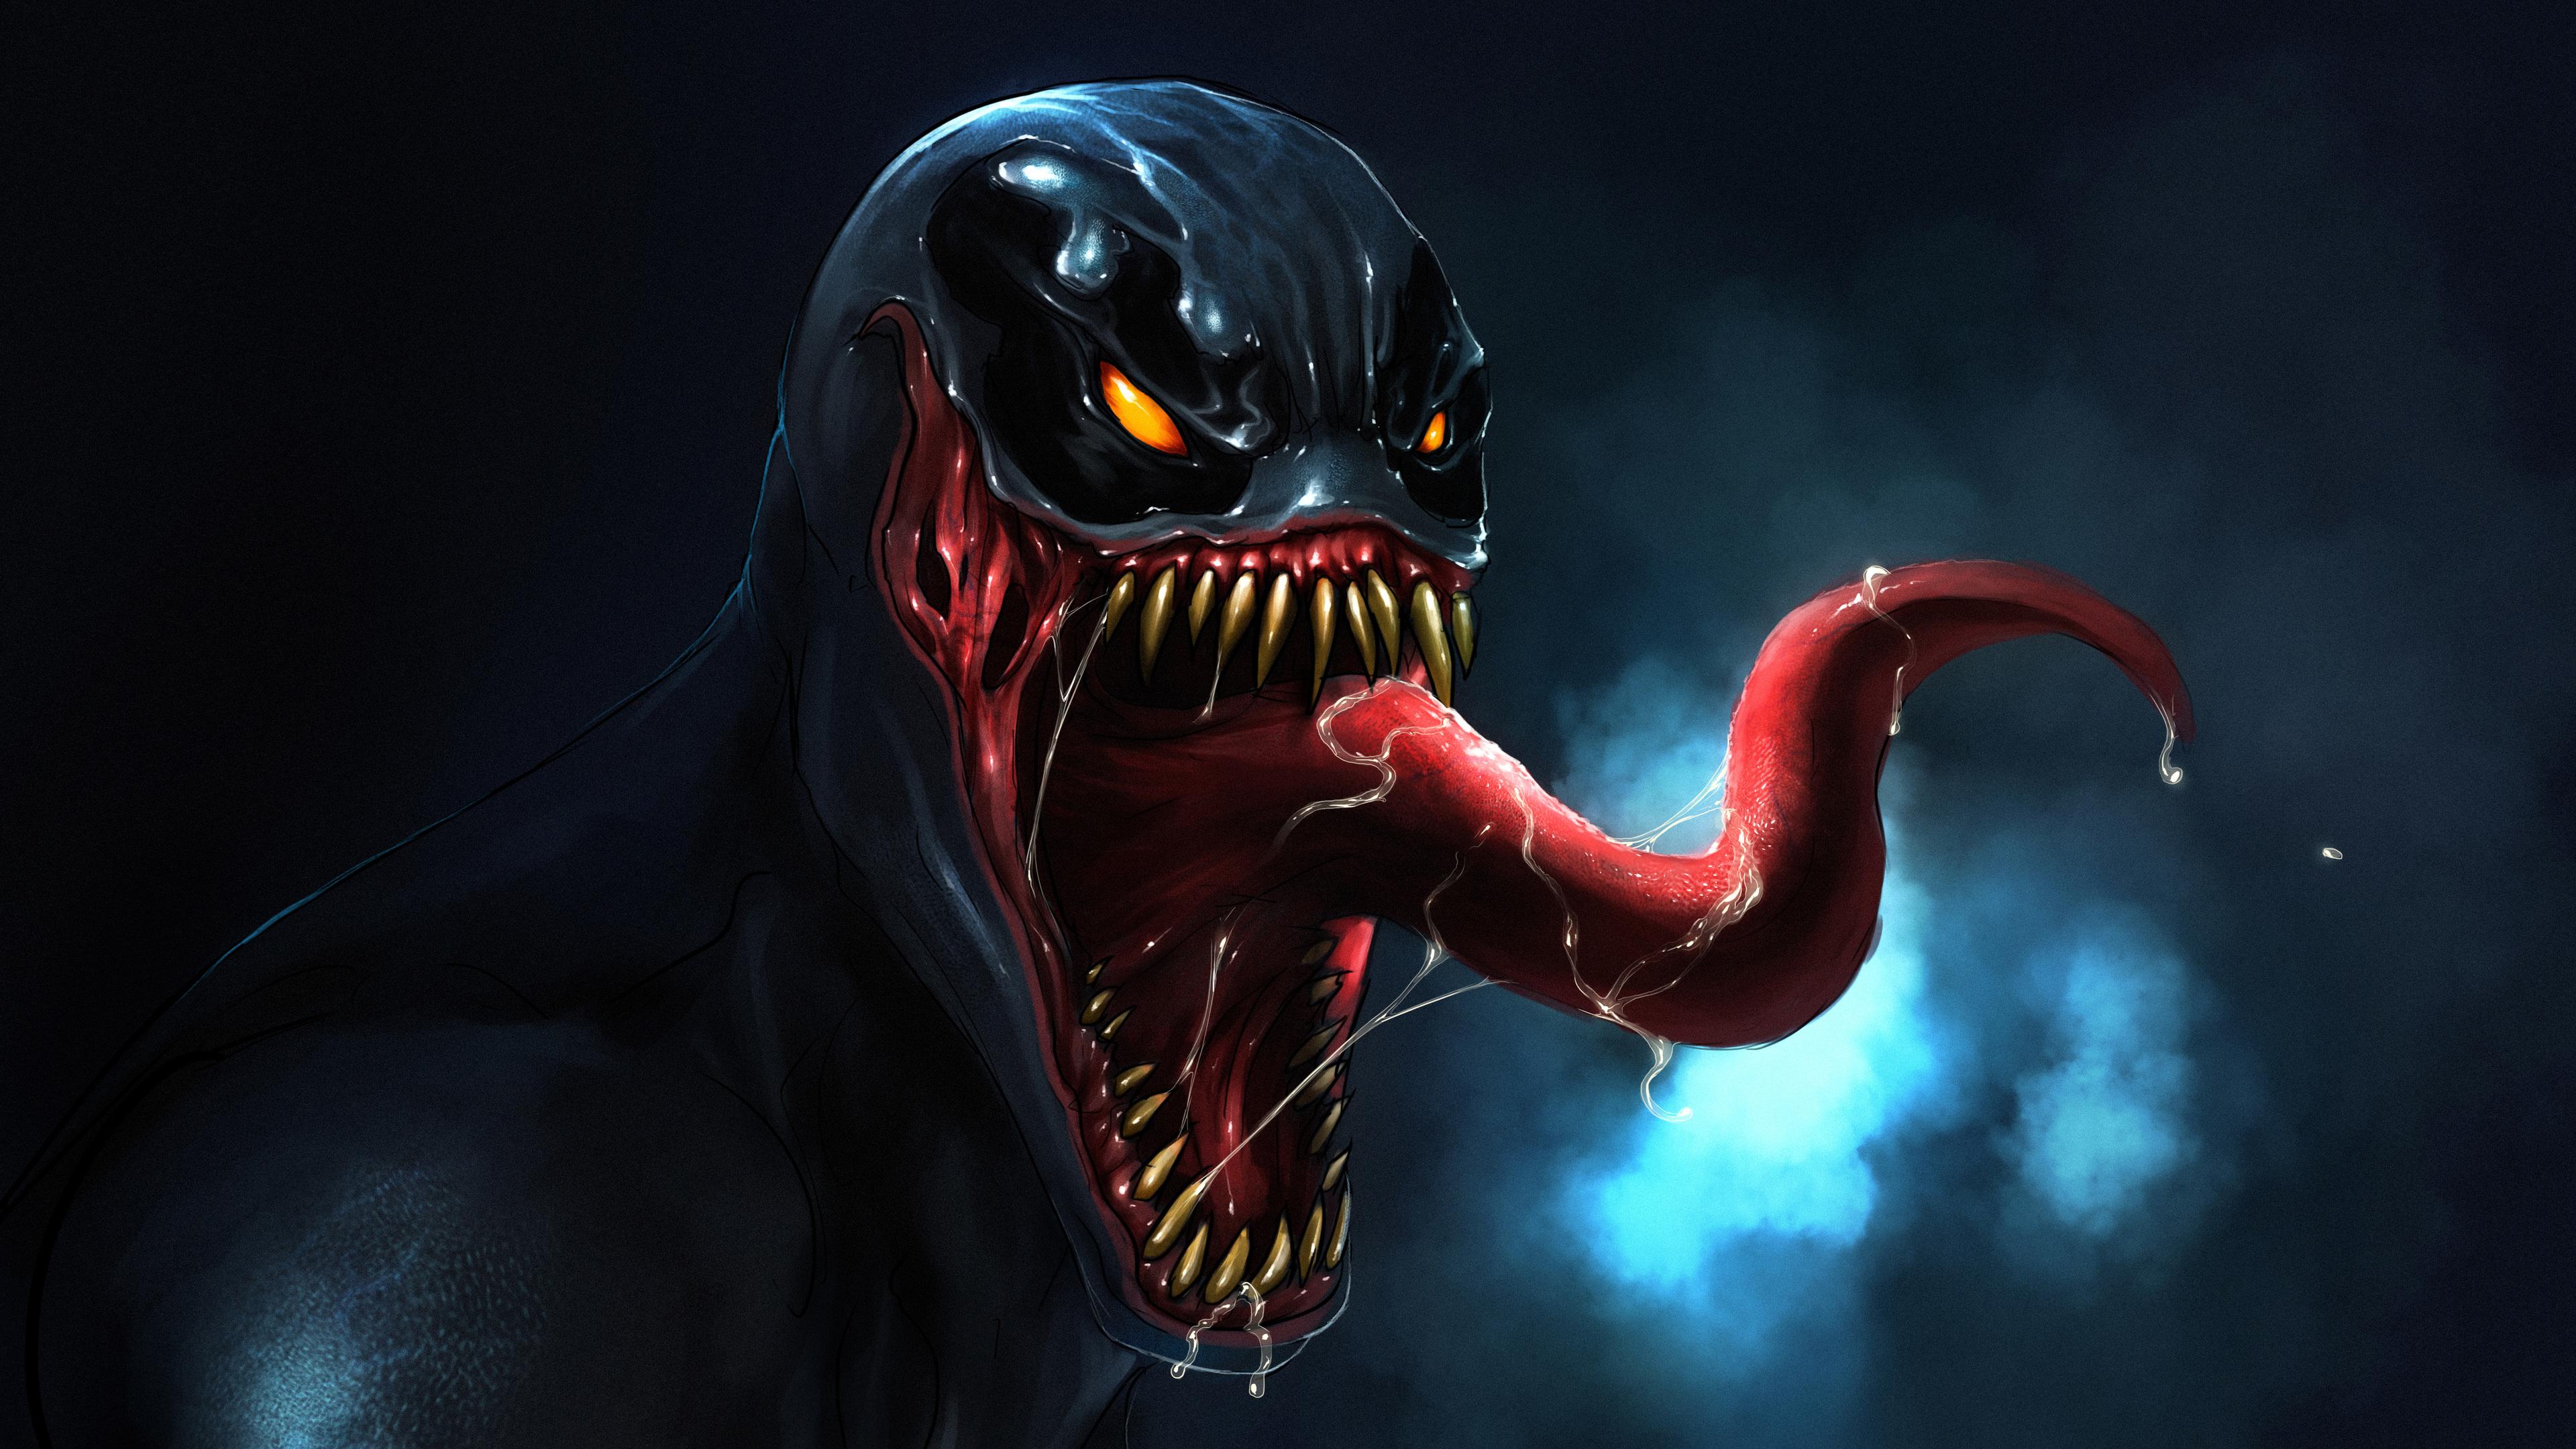 venom 5k artwork 1536523678 - Venom 5k Artwork - Venom wallpapers, venom movie wallpapers, supervillain wallpapers, hd-wallpapers, digital art wallpapers, artwork wallpapers, art wallpapers, 5k wallpapers, 4k-wallpapers